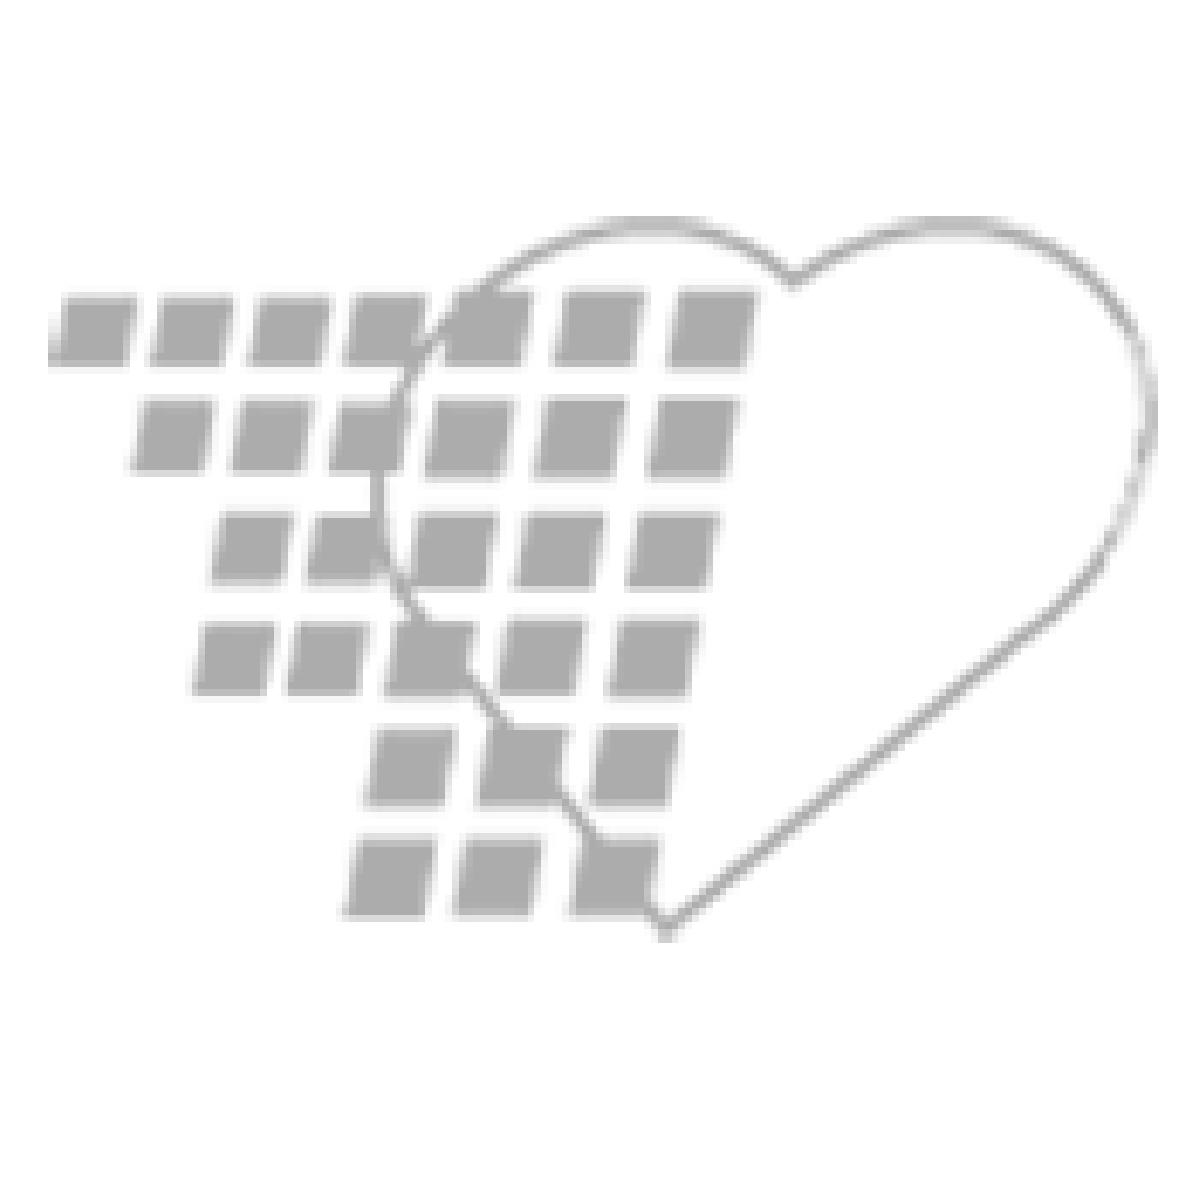 06-69-1096 - Suppository Dispensing Box - Medium